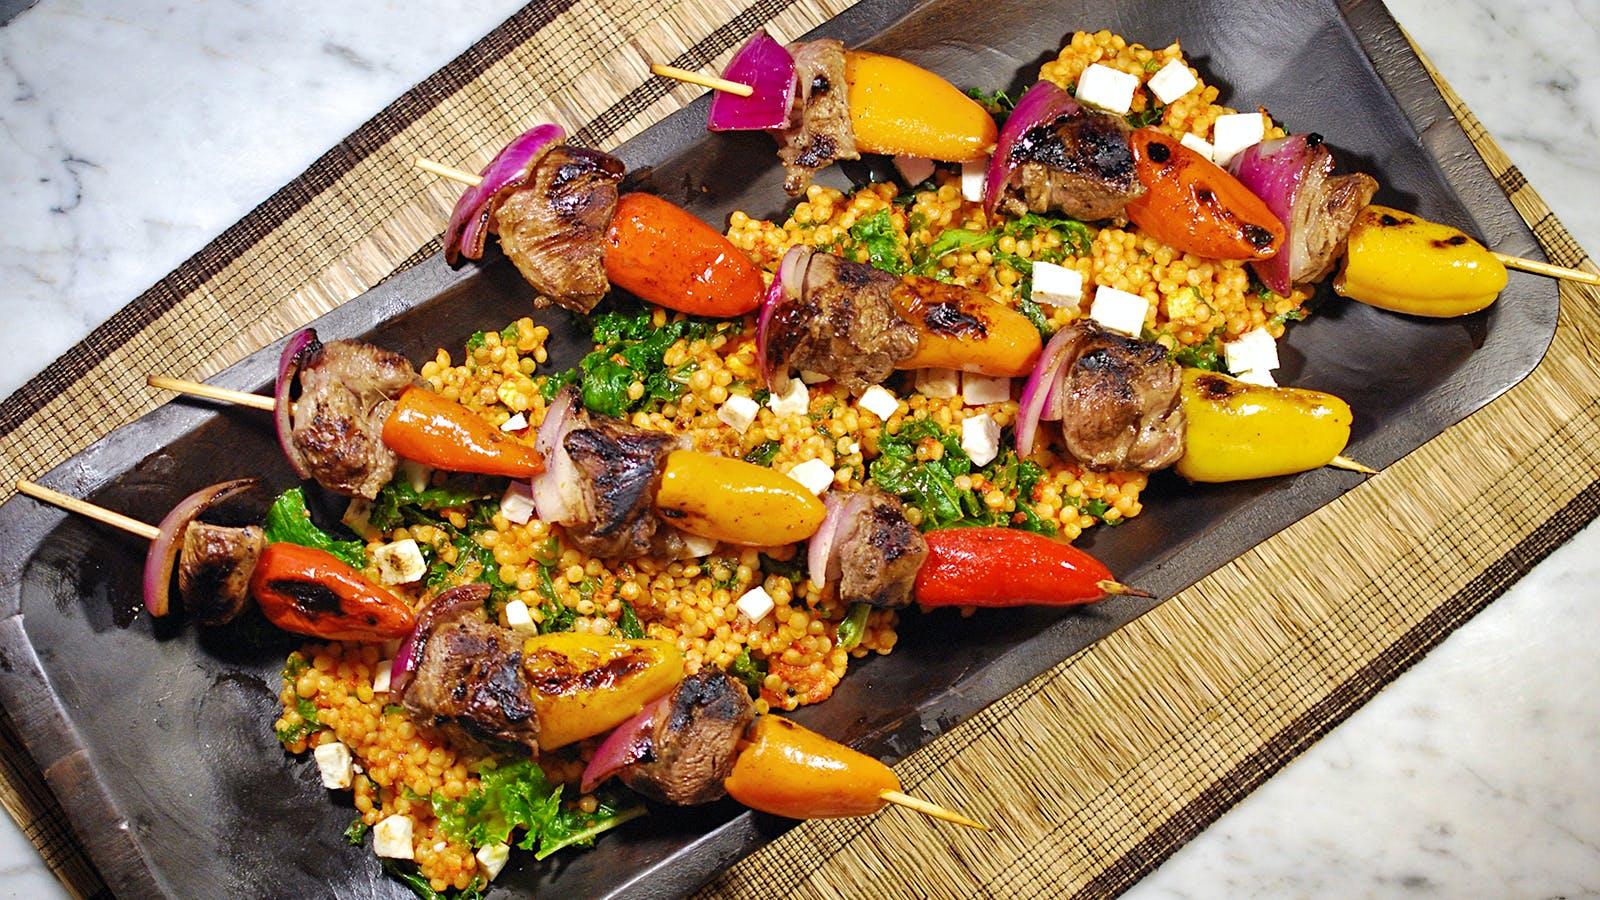 8 & $20: Lamb Kebabs With Israeli Couscous Salad